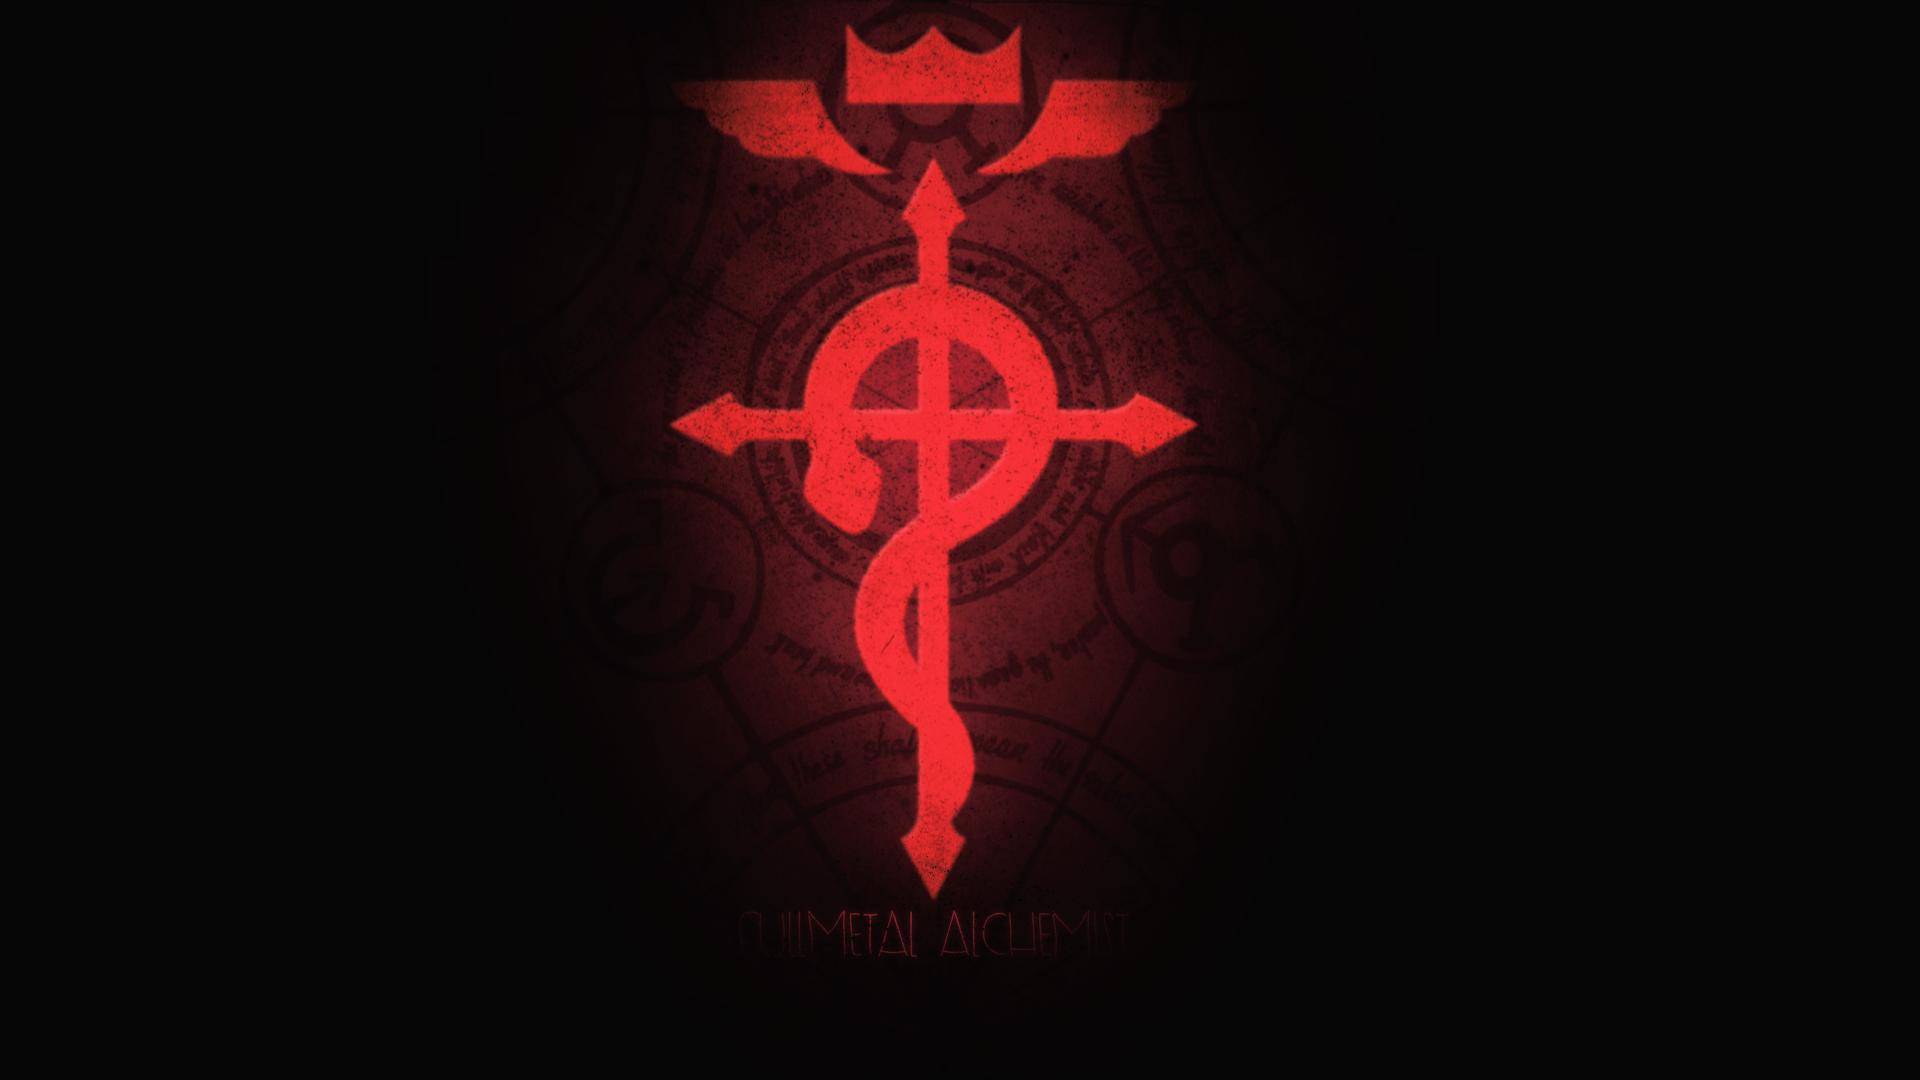 fullmetal alchemist wallpaper by ramzes100 on deviantart